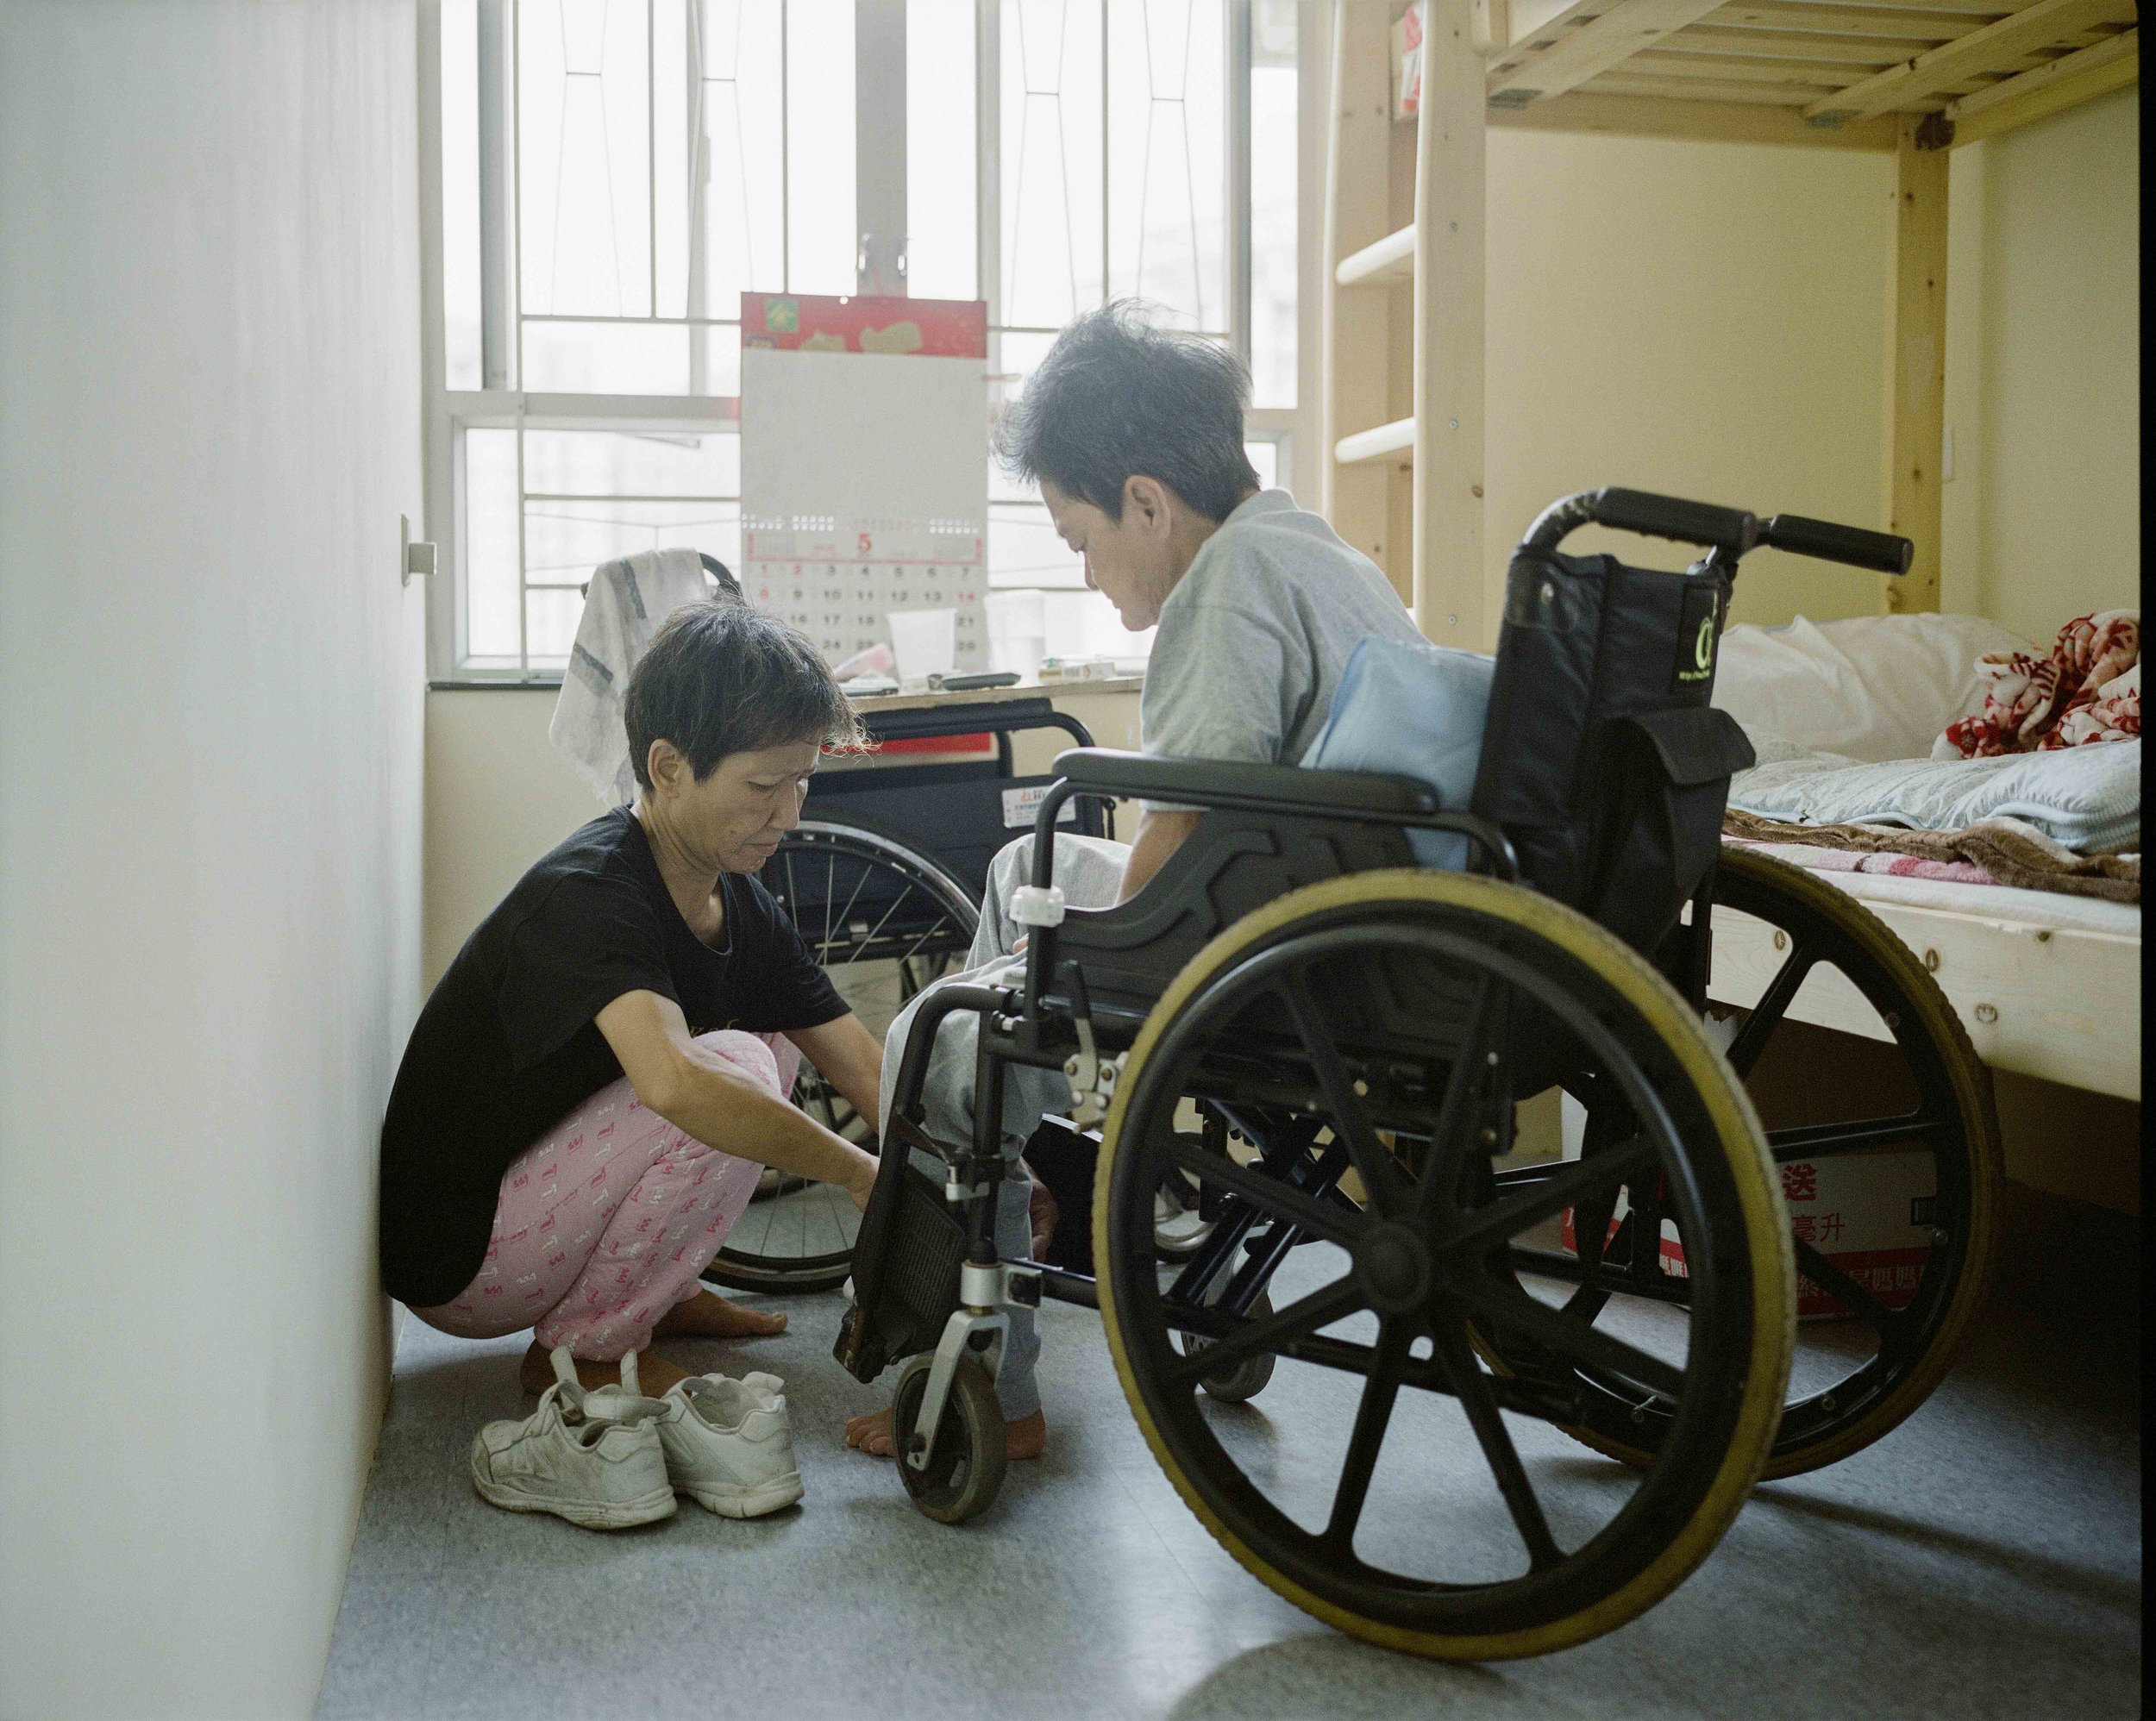 PHOTO: Lam Chun Tung